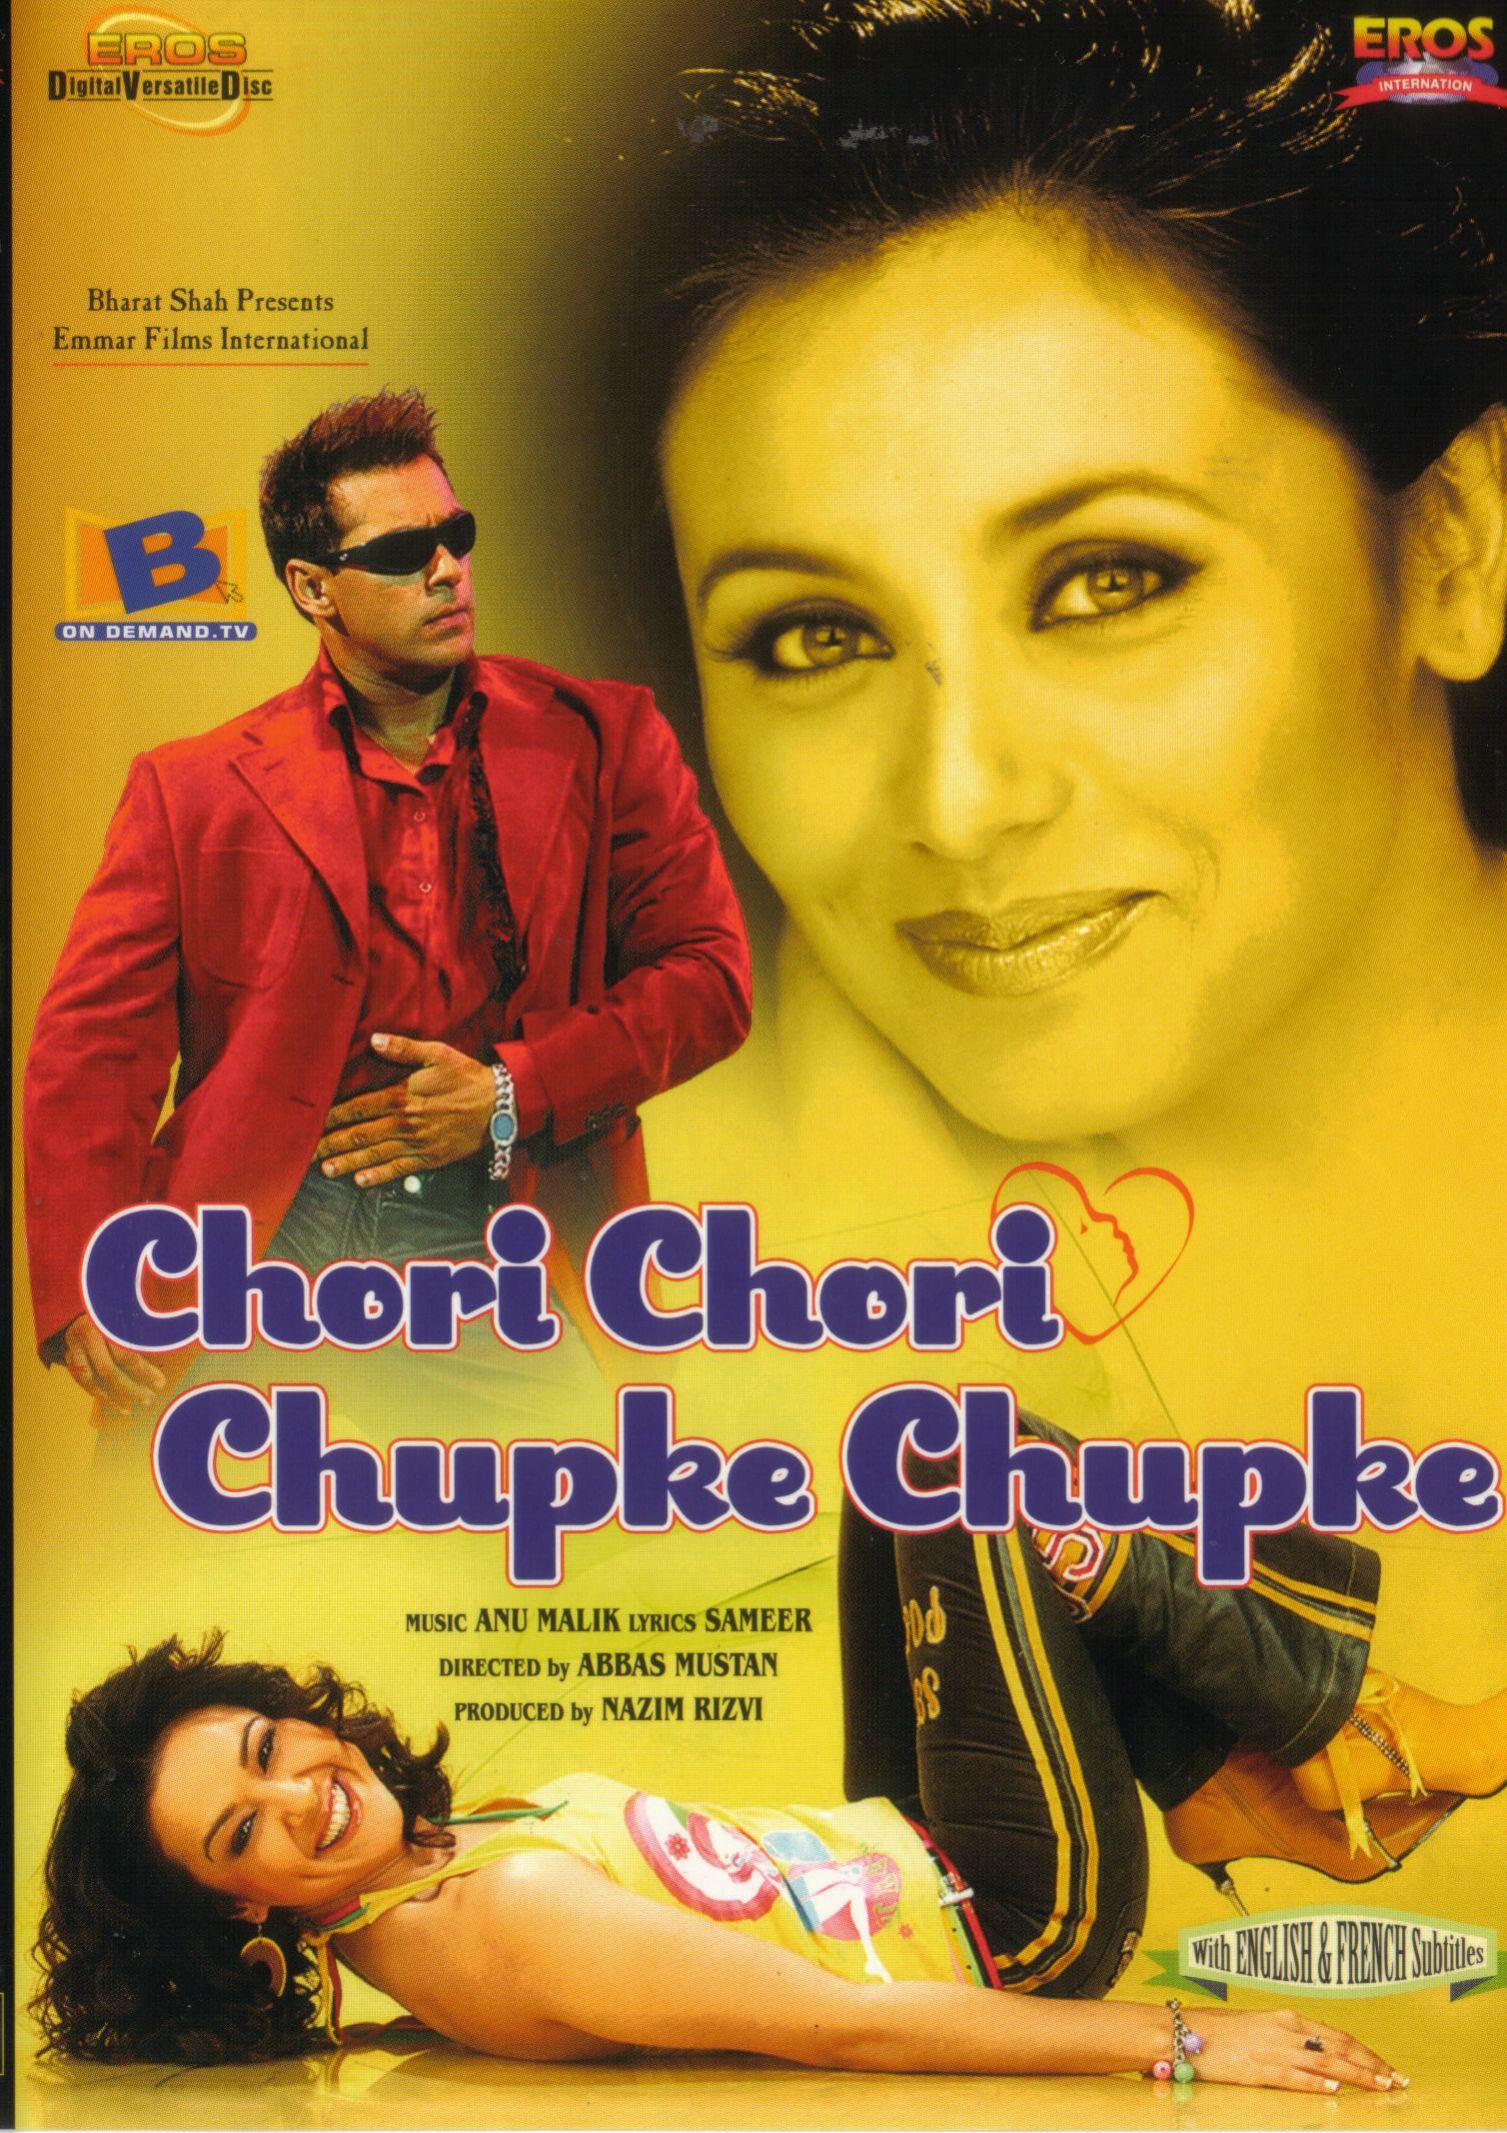 Chori Chori Chupke Chupke Movie Poster Salman Khan Rani Mukerji Preity Zinta